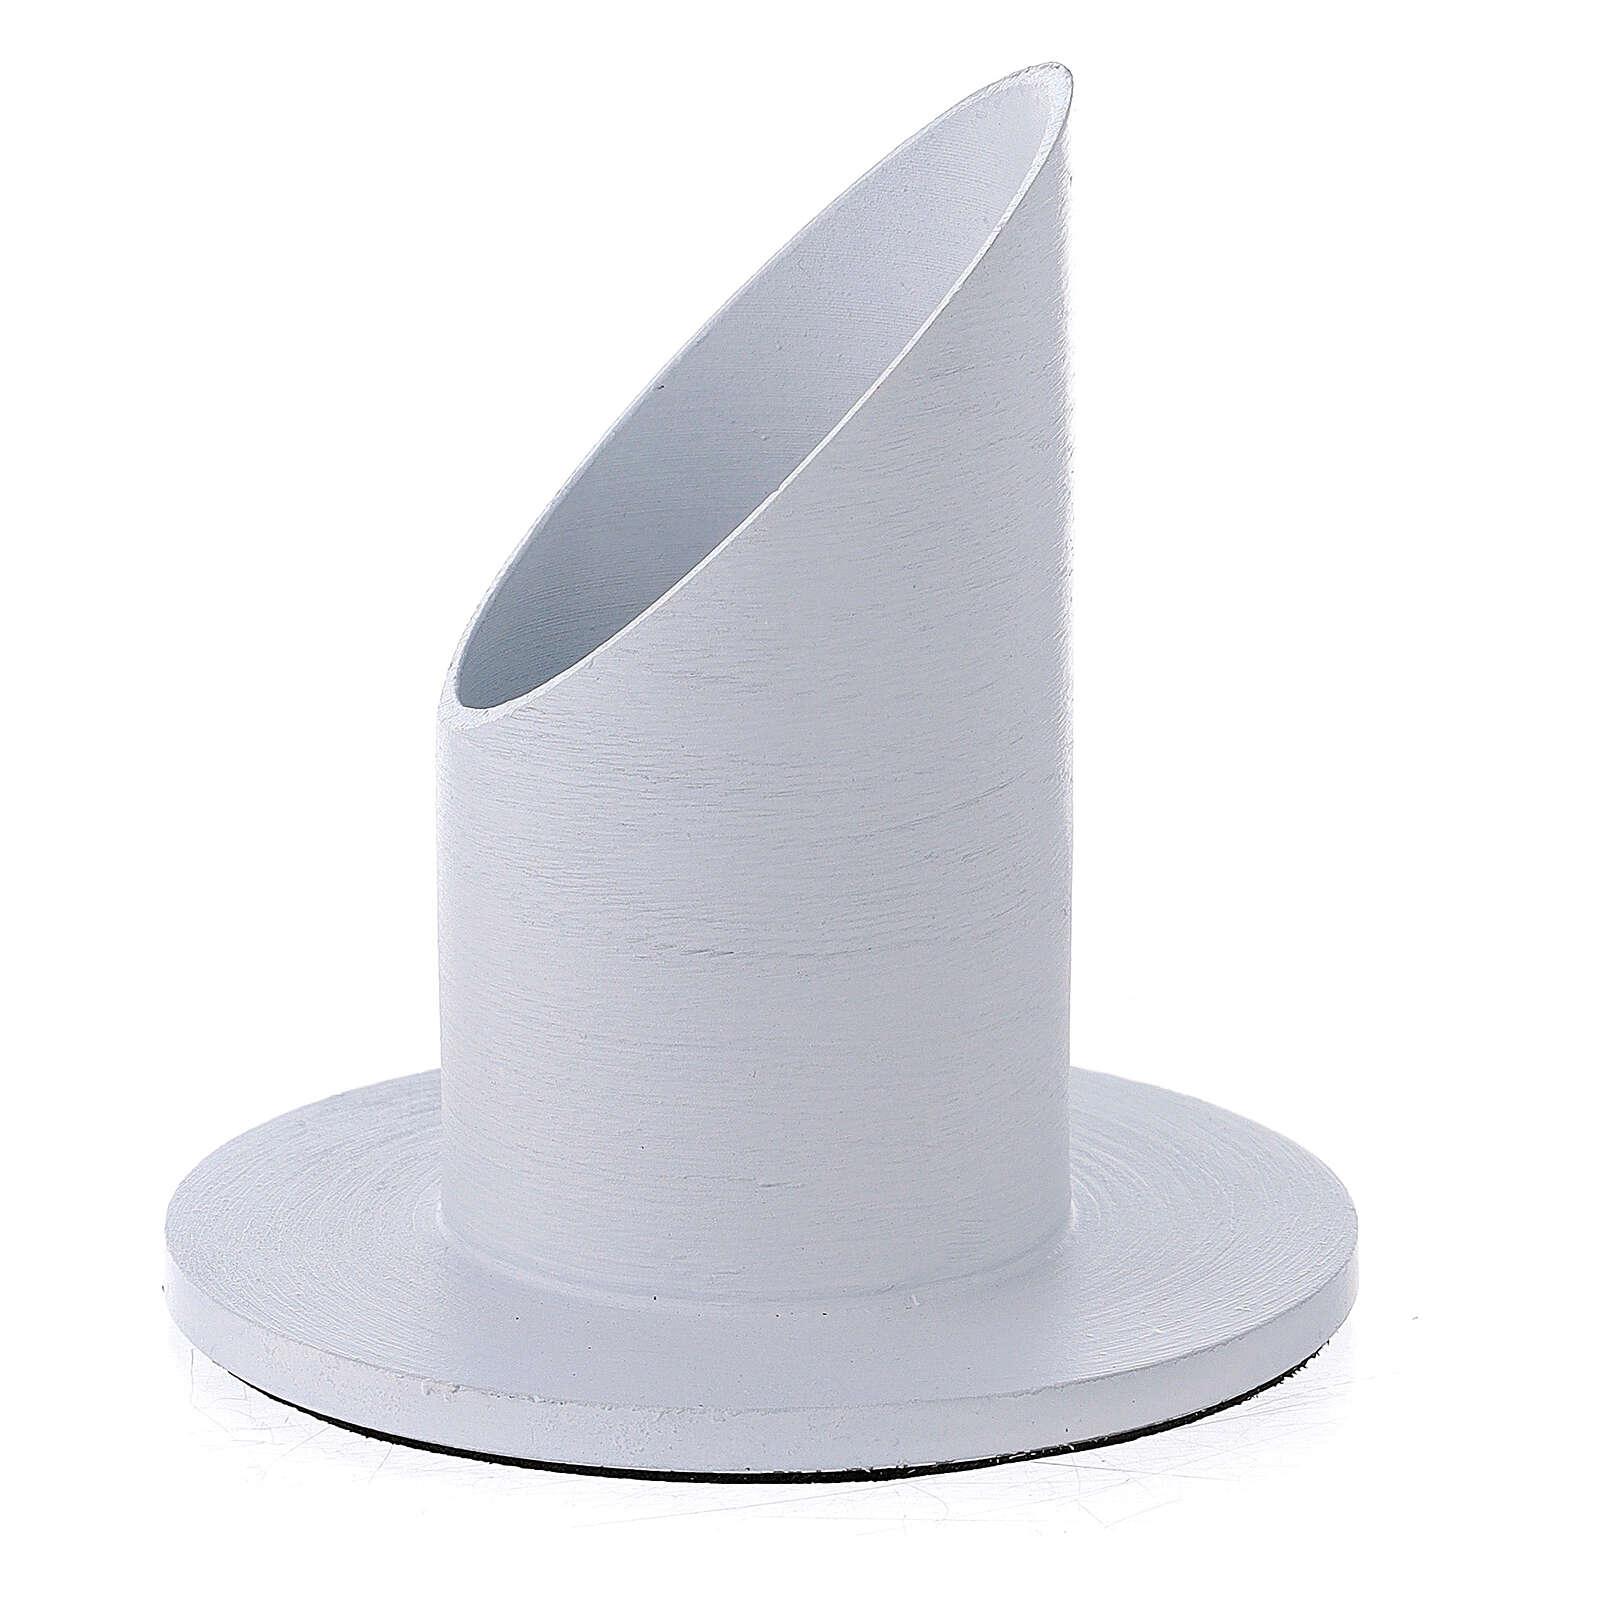 Portavela aluminio cepillado blanco 4 cm 3